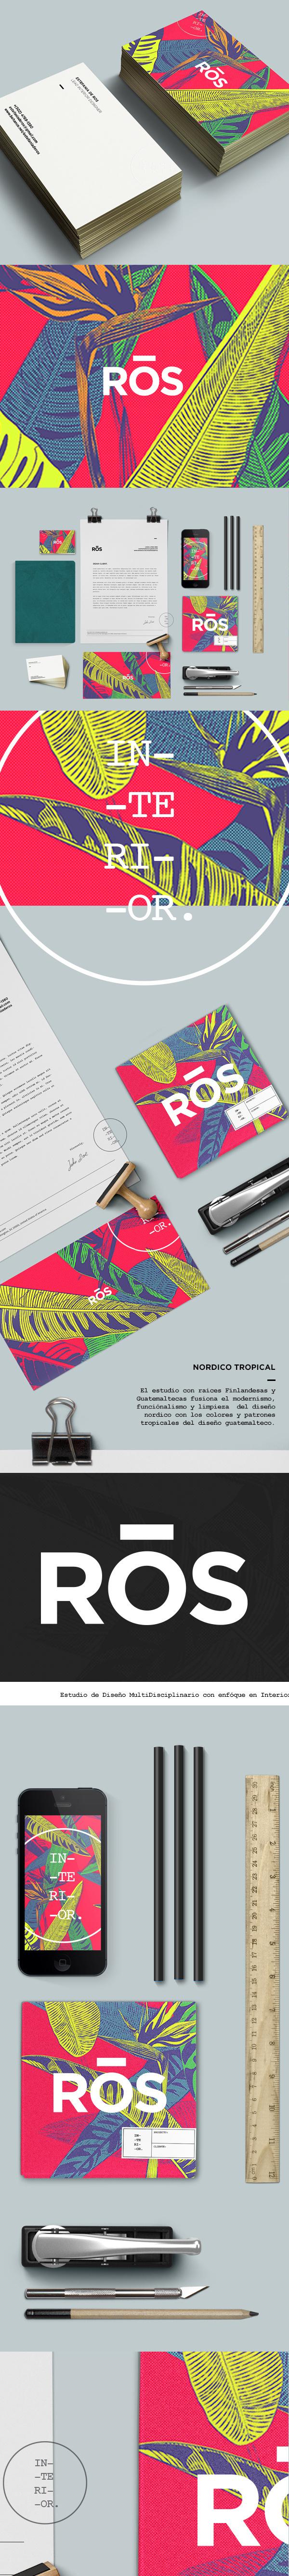 Ros Interior Design by Gustavo Quintana